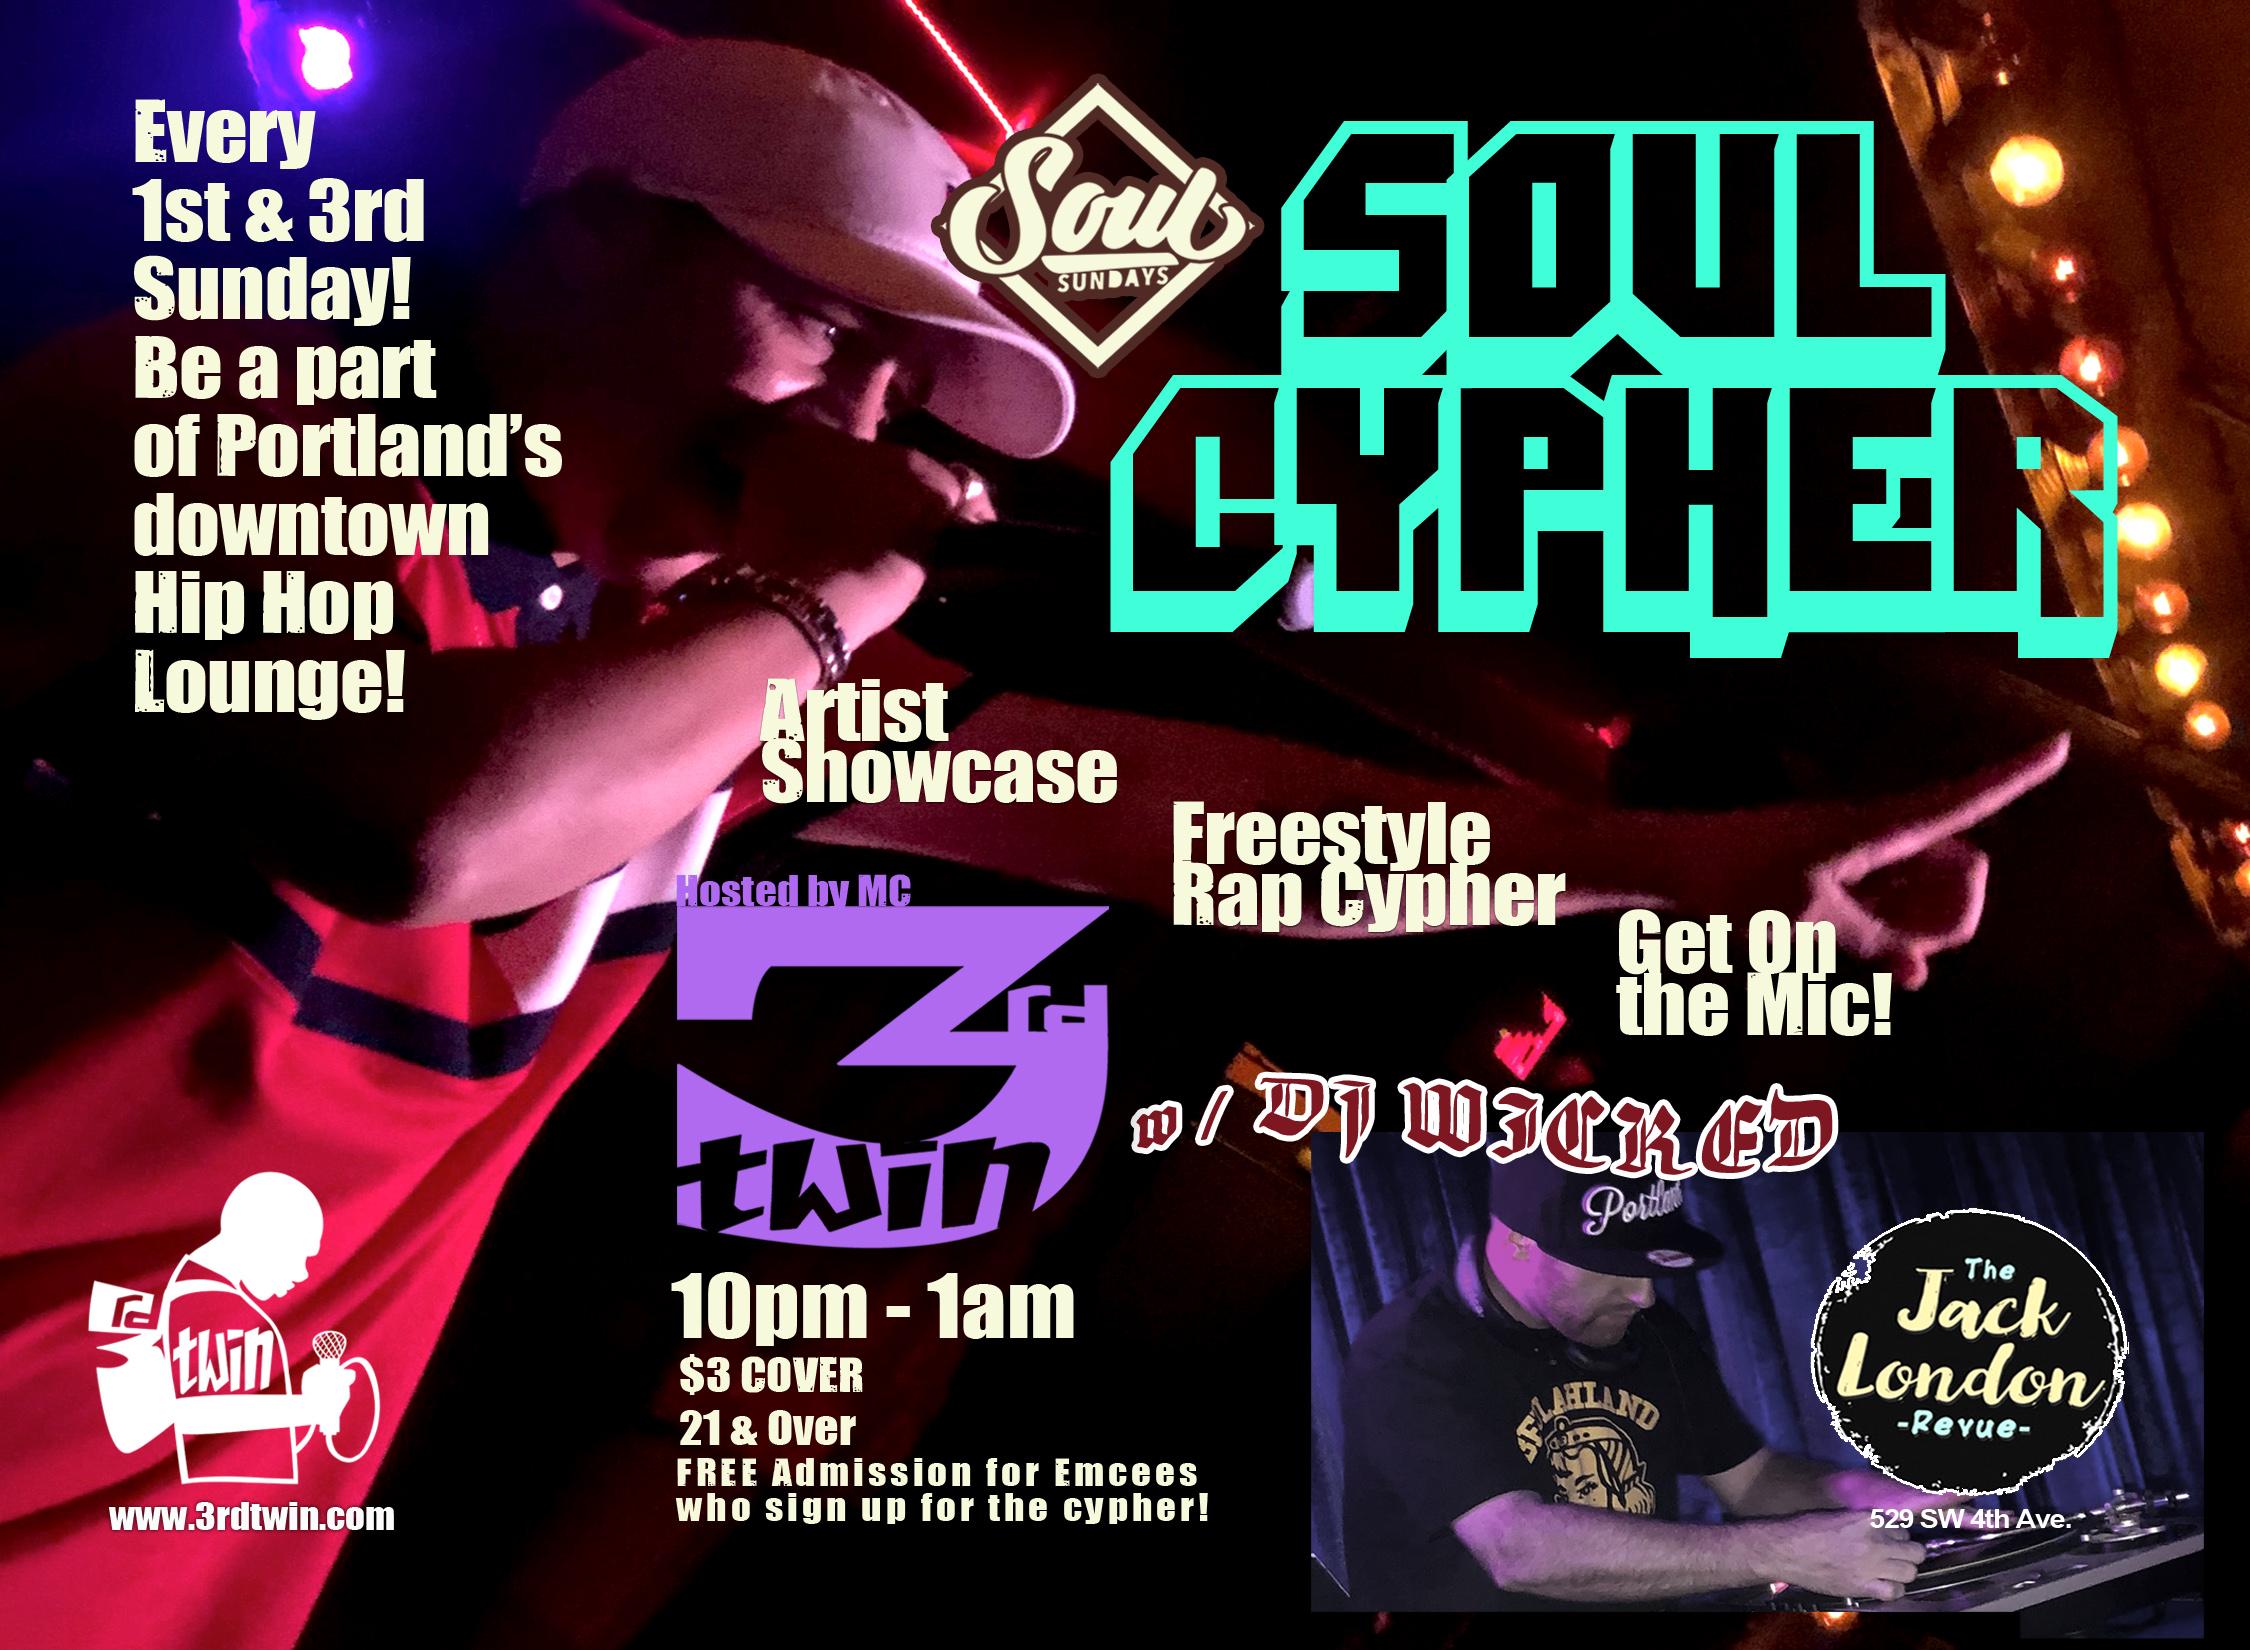 Soul Cypher Promo Flyer_Front.jpg